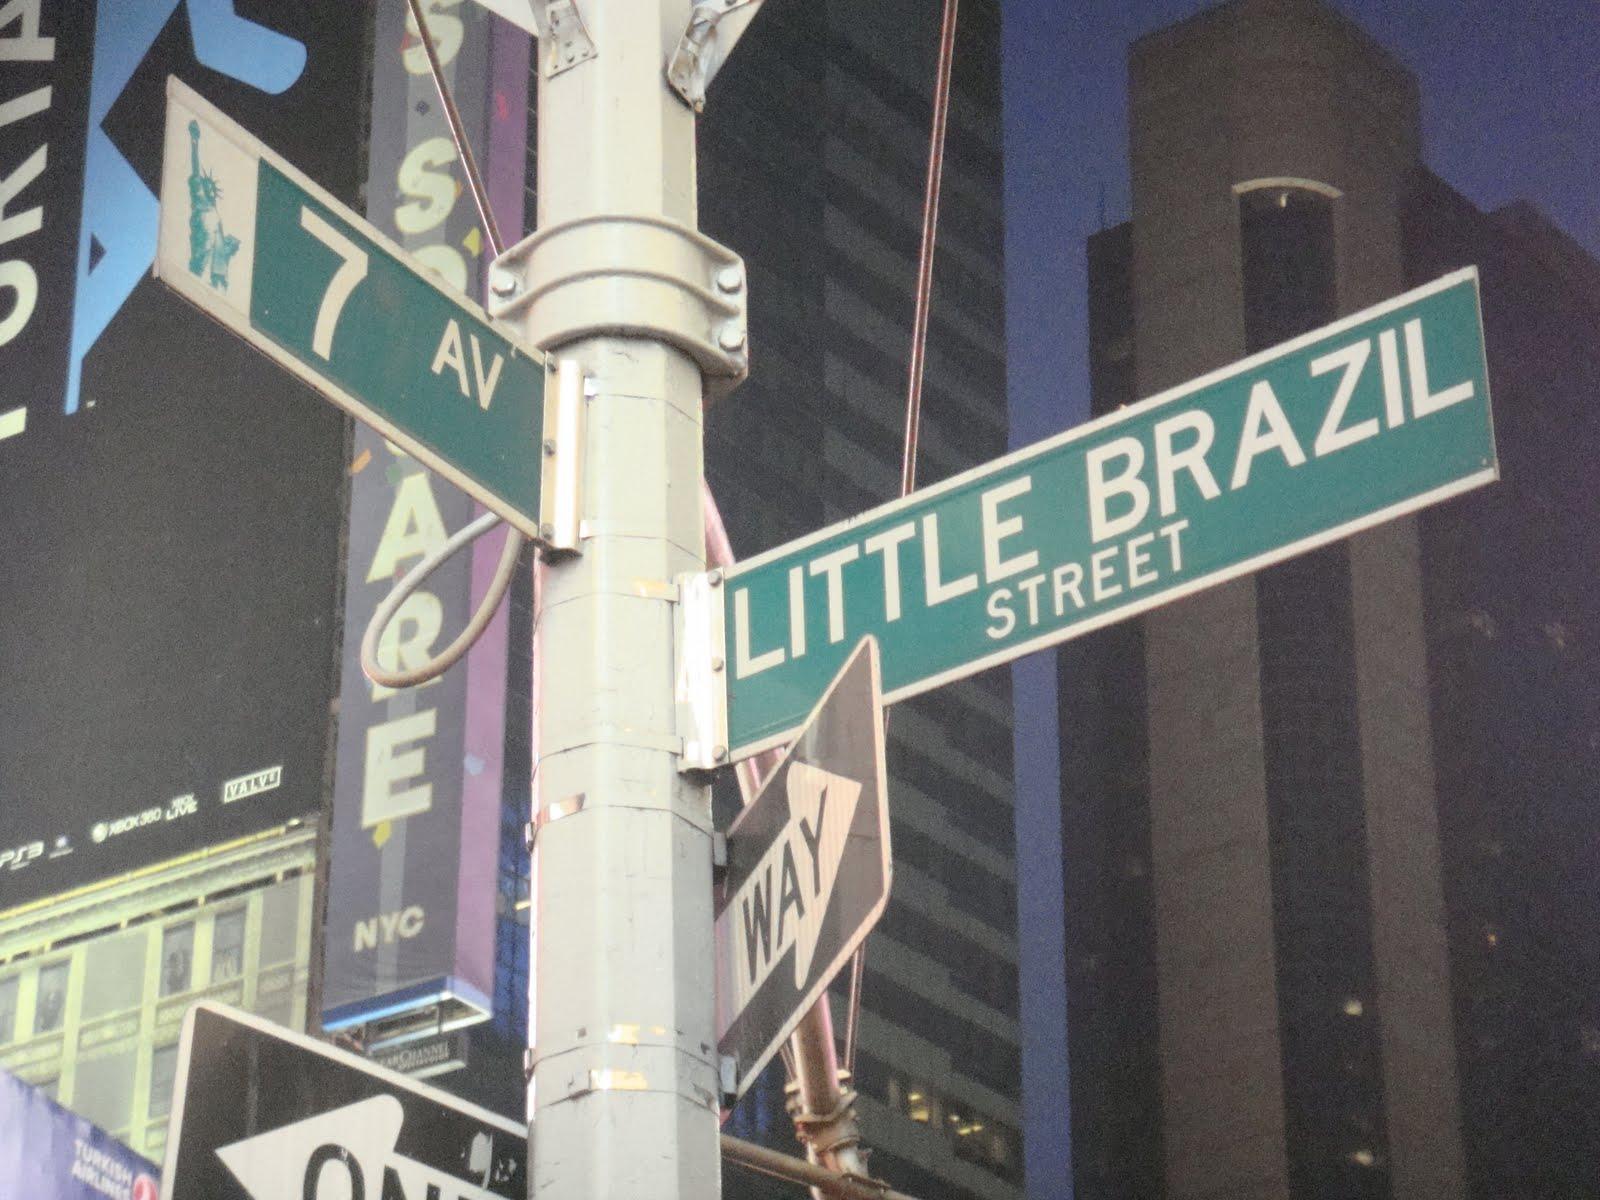 Time Square, Manhattan, New York, Elisa N, Blog de Viajes, Lifestyle, Travel